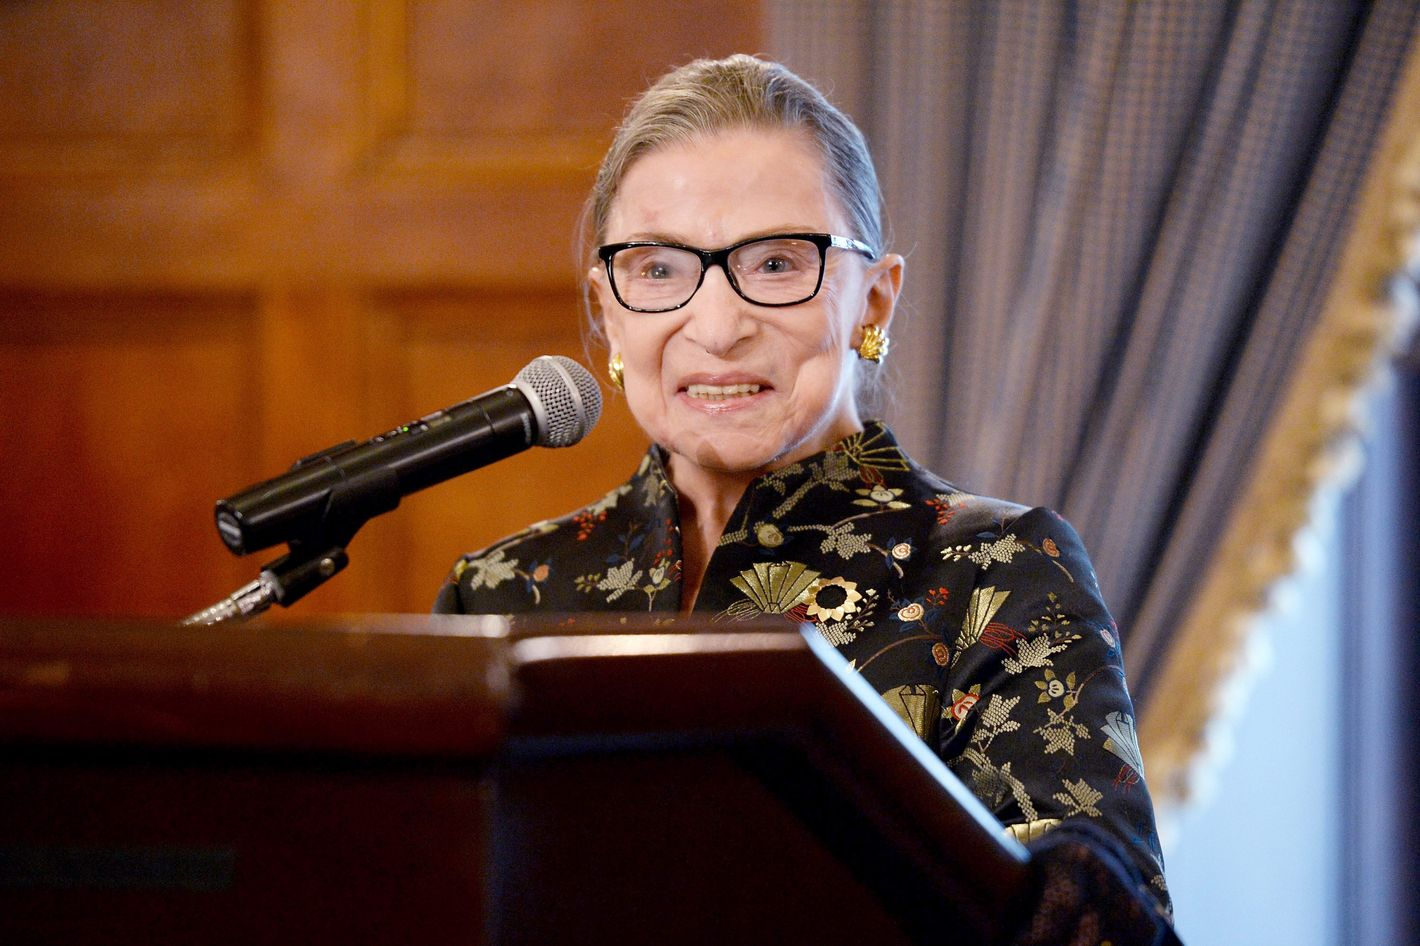 Ruth Bader Ginsburg Can Probably Do More Push-ups Than You